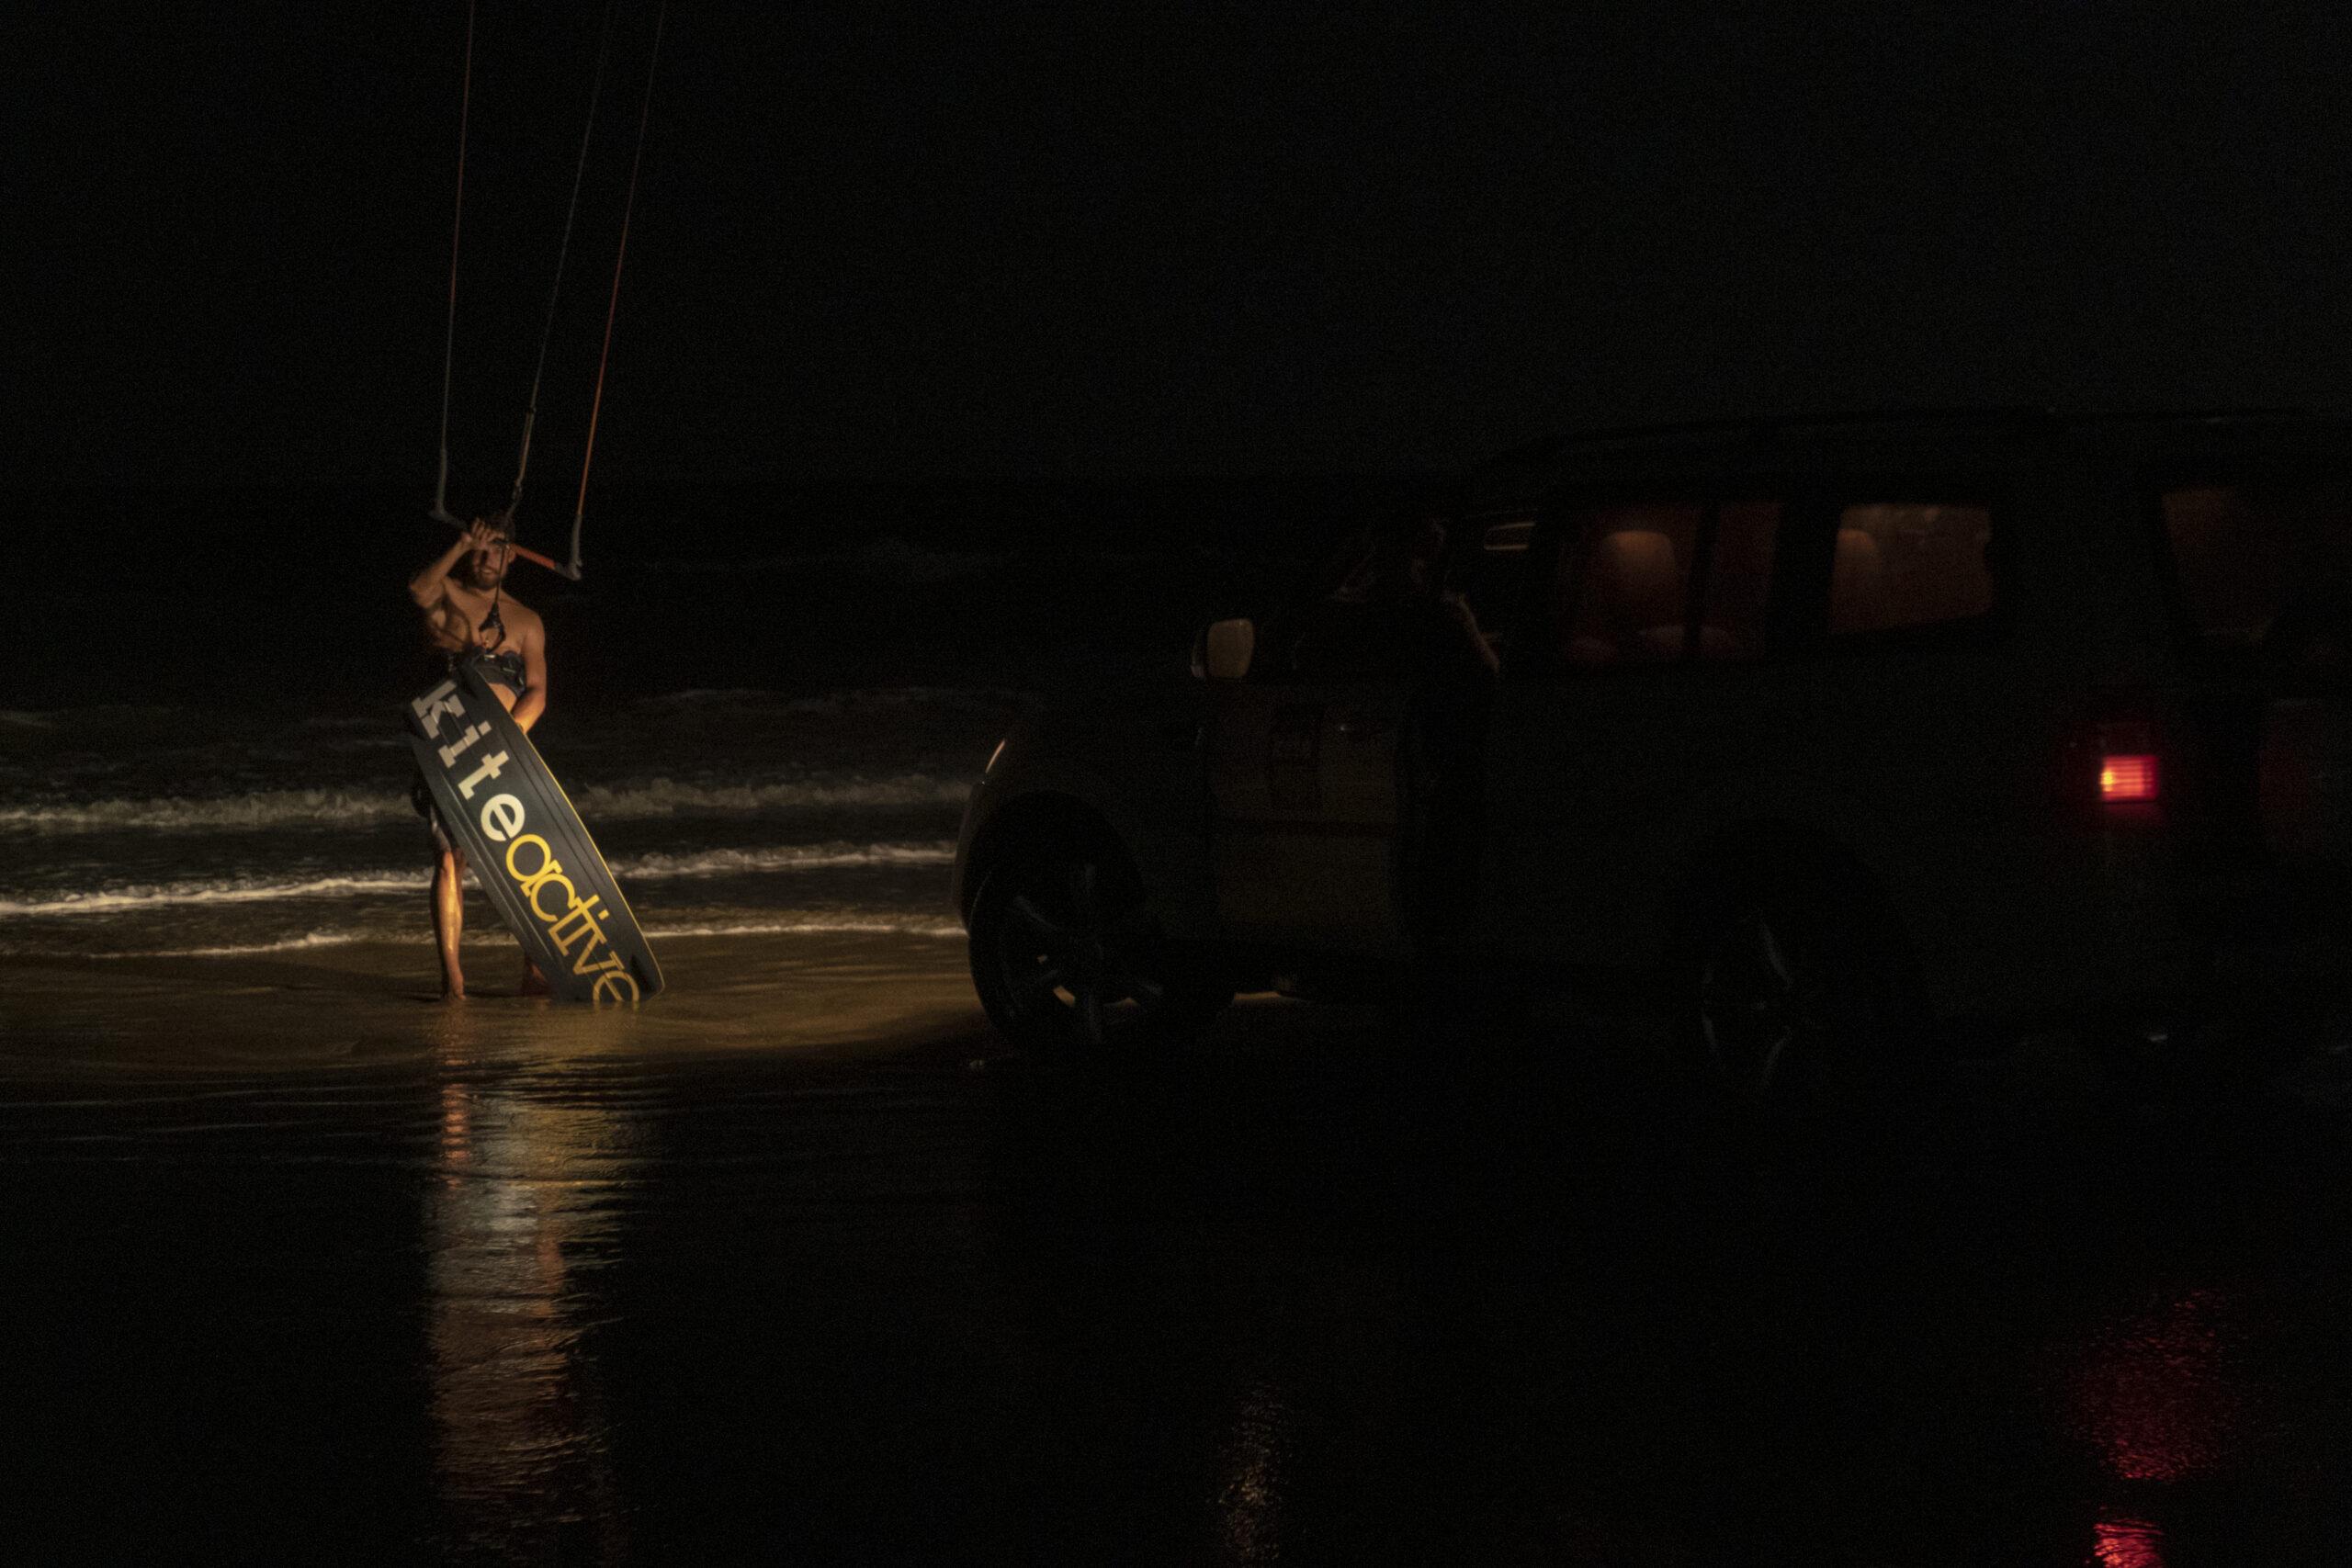 kitesurf-night-full-moon-brazil